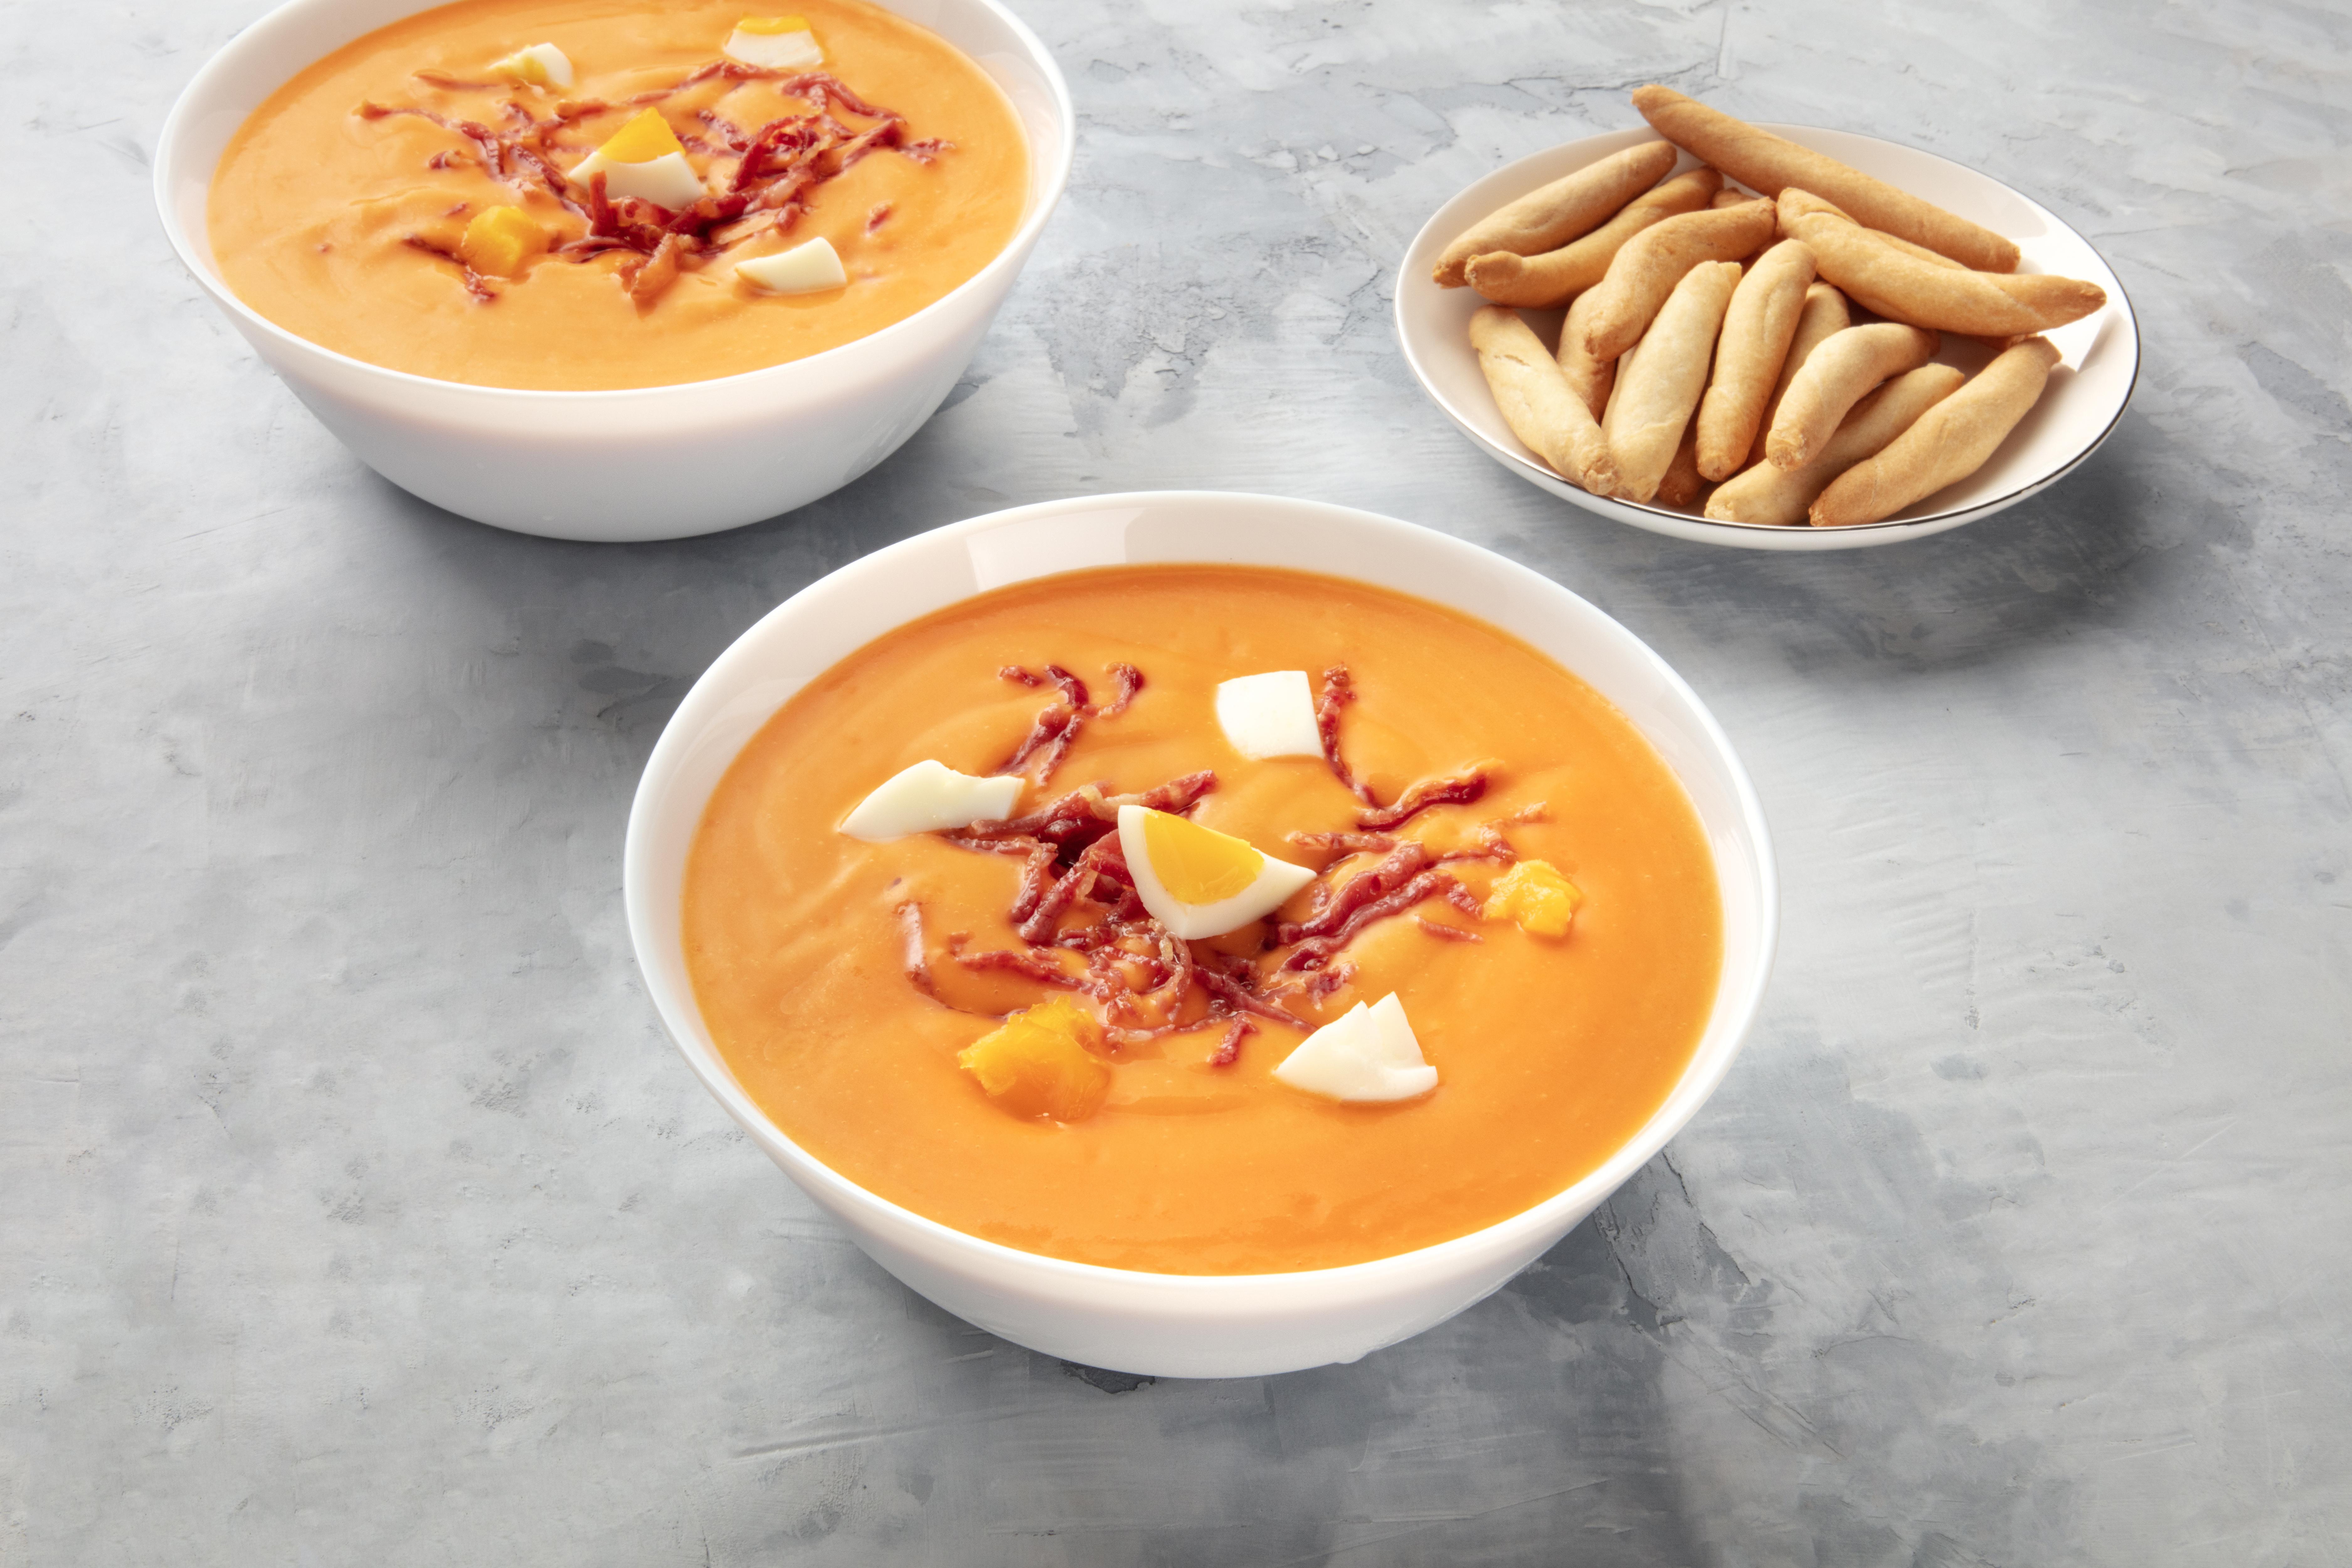 SPANISH TOMATO SOUP